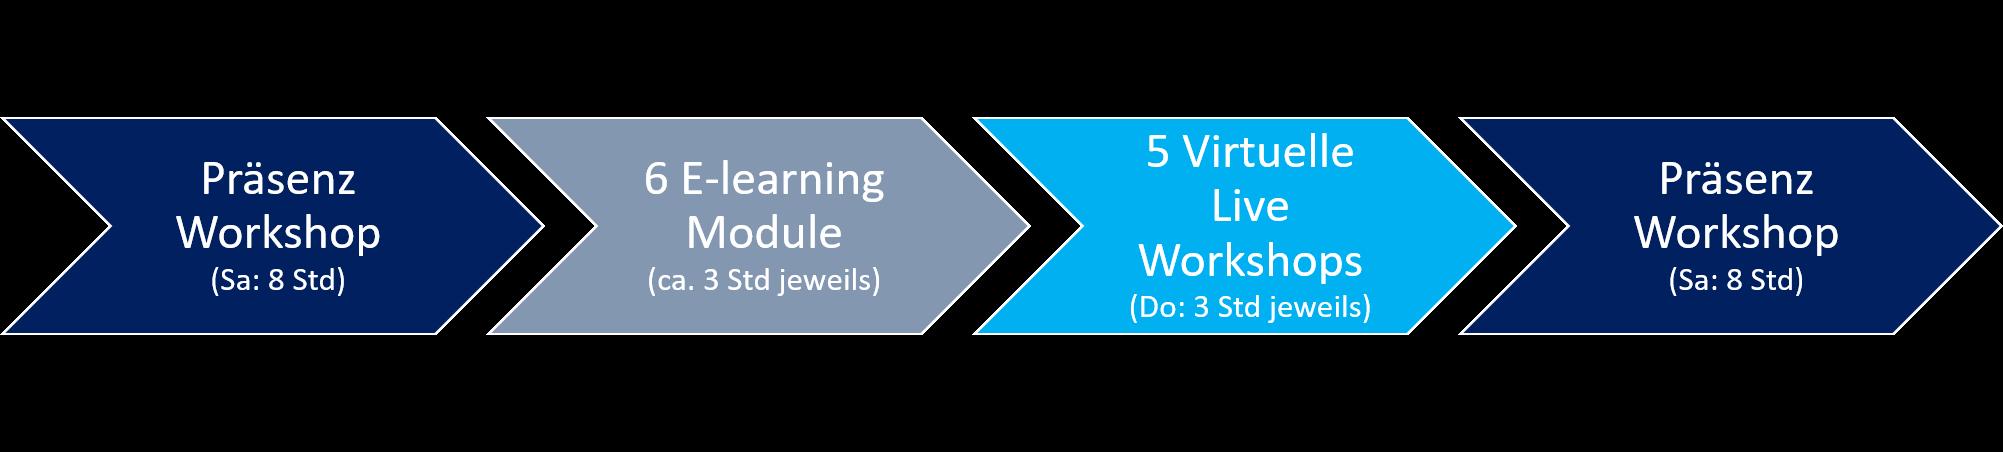 Ablauf des Lehrgangs: Präsenzworkshop (8h) - 6 E-Learning Module (6 x 3h) - 6 Virtuelle Workshops (6x3h) - Präsenzworkshop (8h)